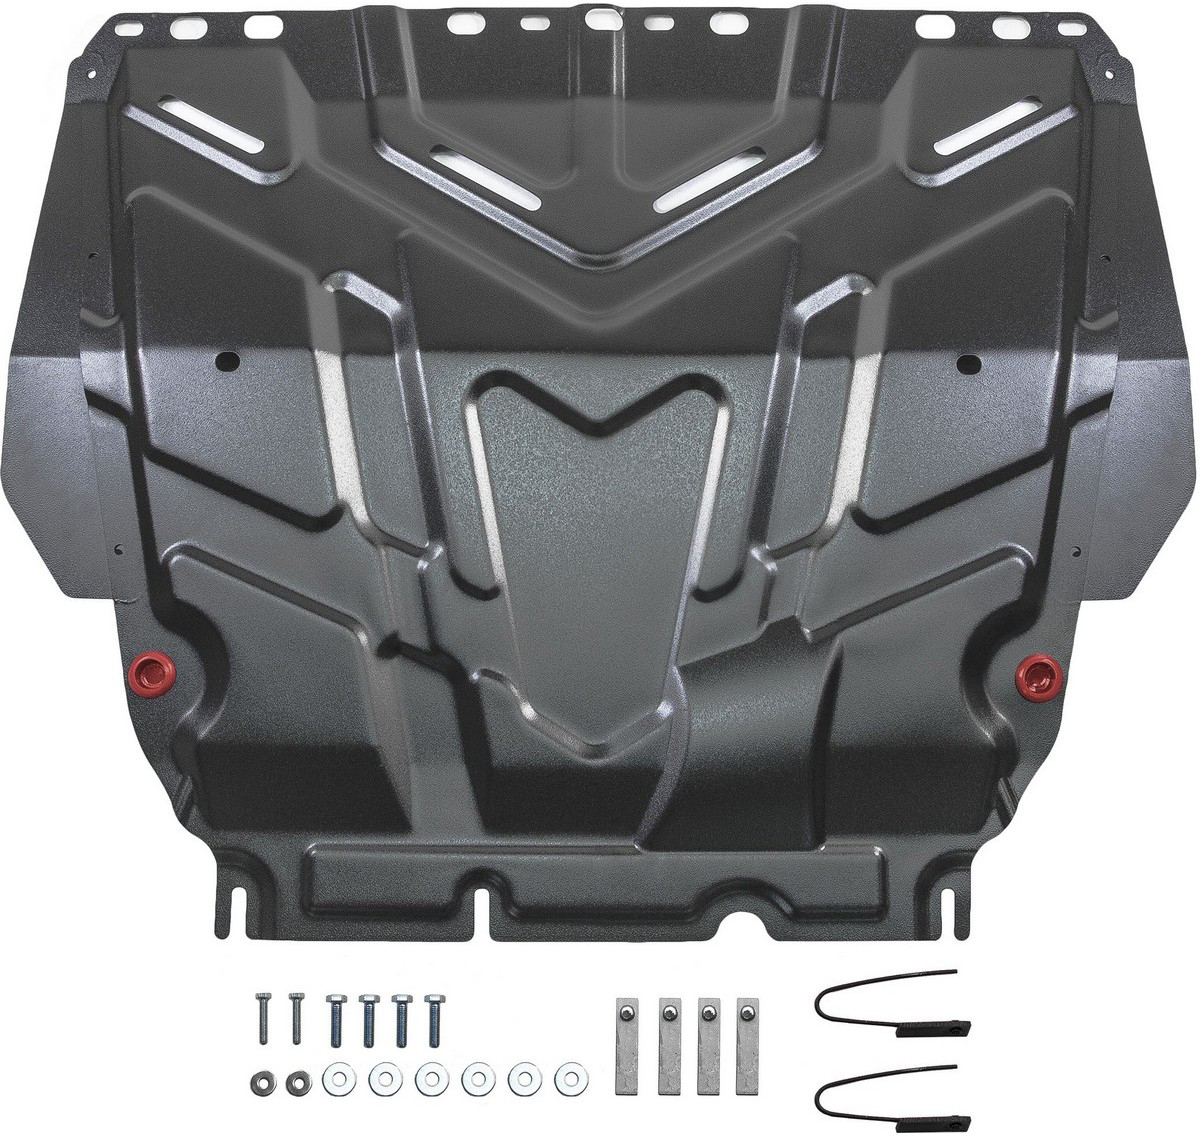 Купить Защита картера и КПП Автоброня Ford Focus 2005-2011 2011-2015 2015-/Ford С-Max 2003-2010/Ford Grand C-Max 2010-2015/Ford Kuga 2008-2013, сталь 2 мм